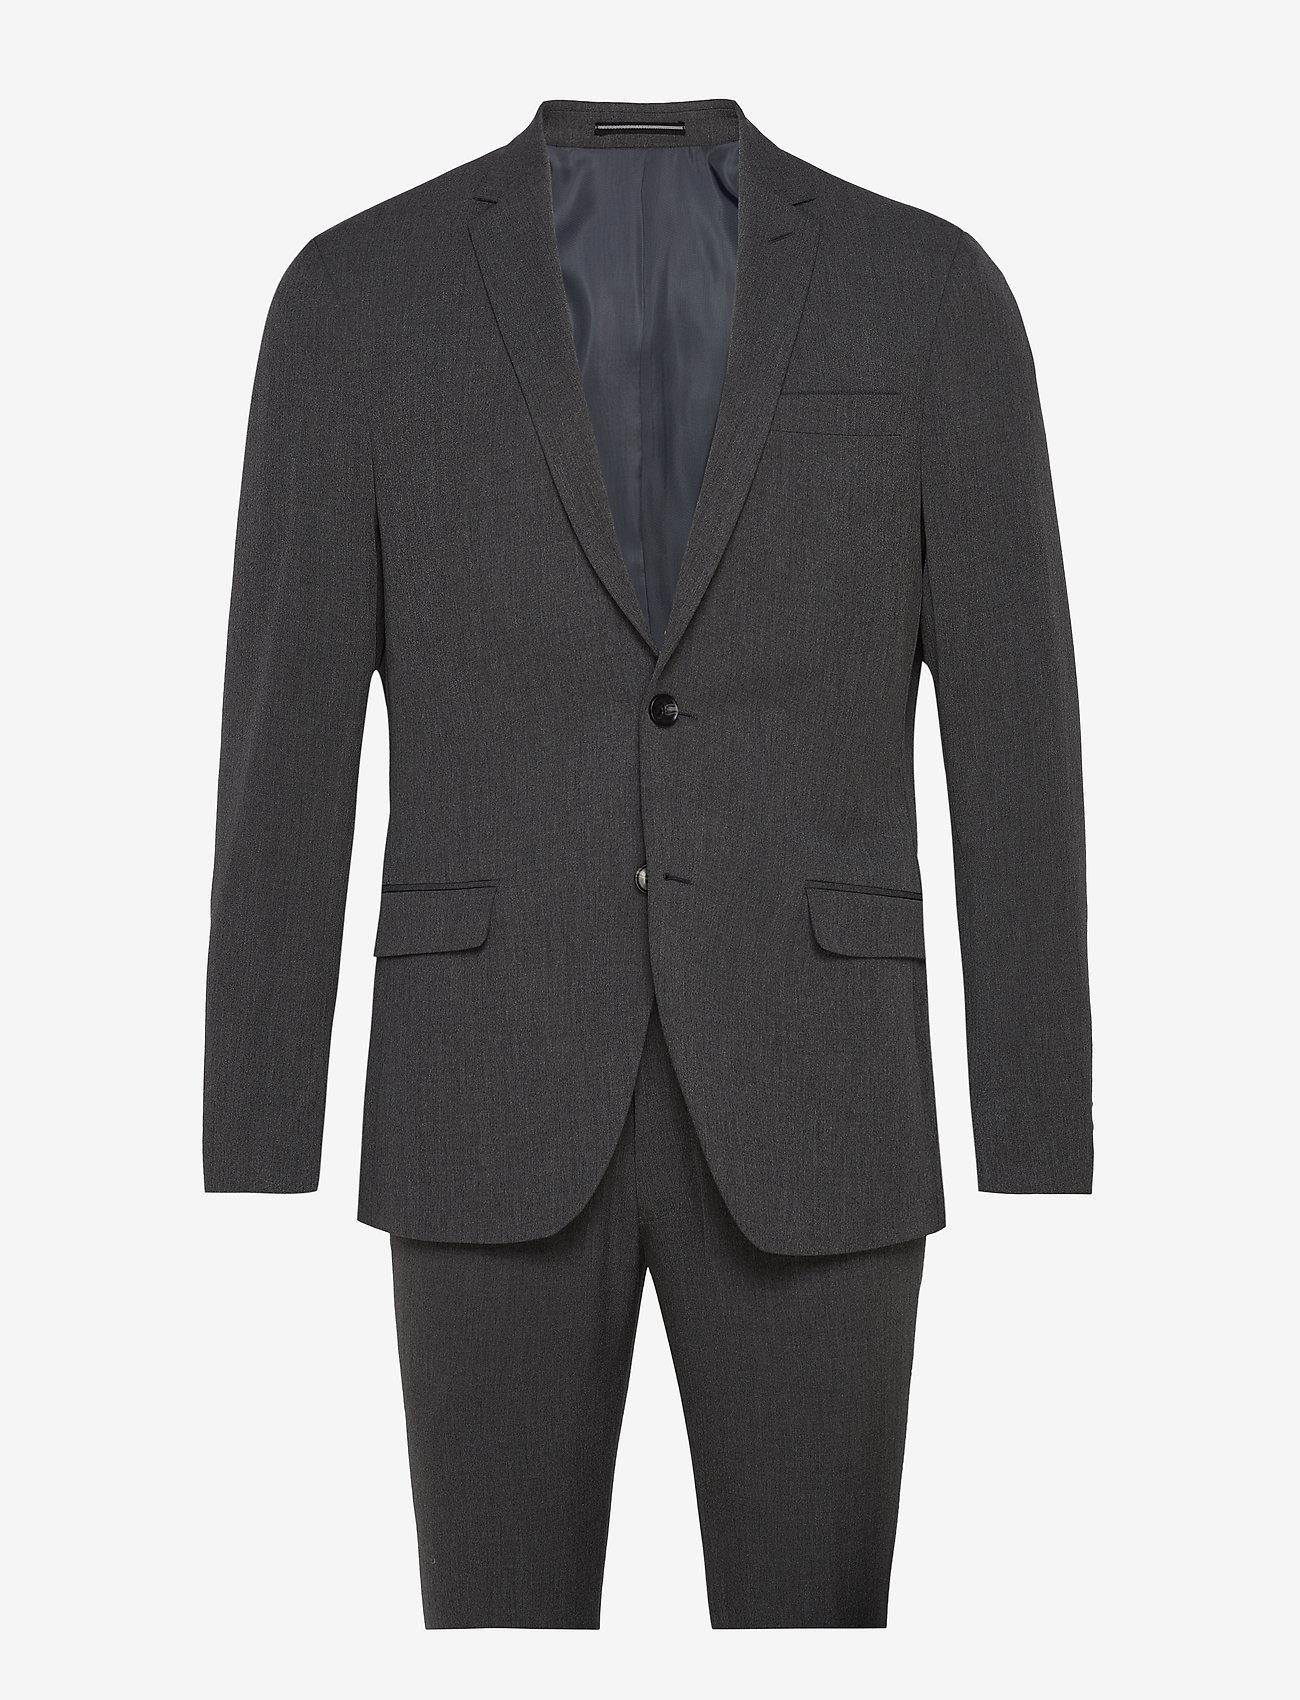 Bertoni - Suit Andersen-Jepsen - single breasted suits - 968 slate - 0